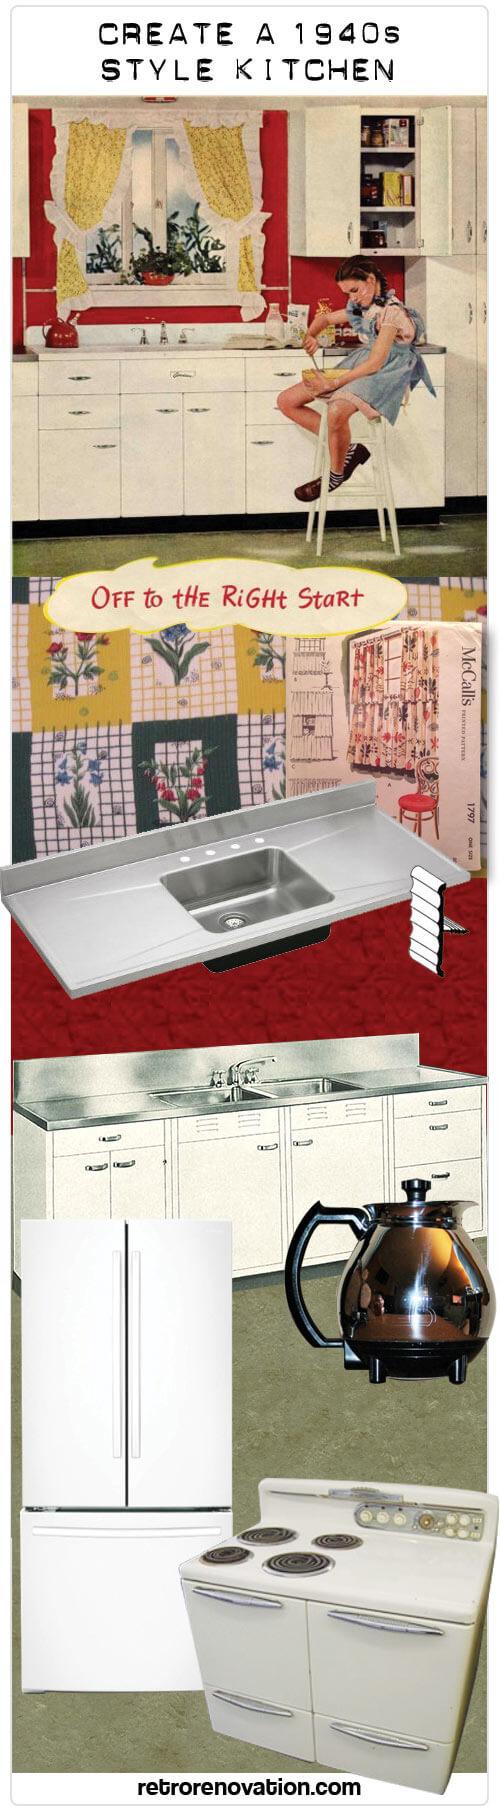 my 1940s kitchen design board 3 retro renovation. Black Bedroom Furniture Sets. Home Design Ideas